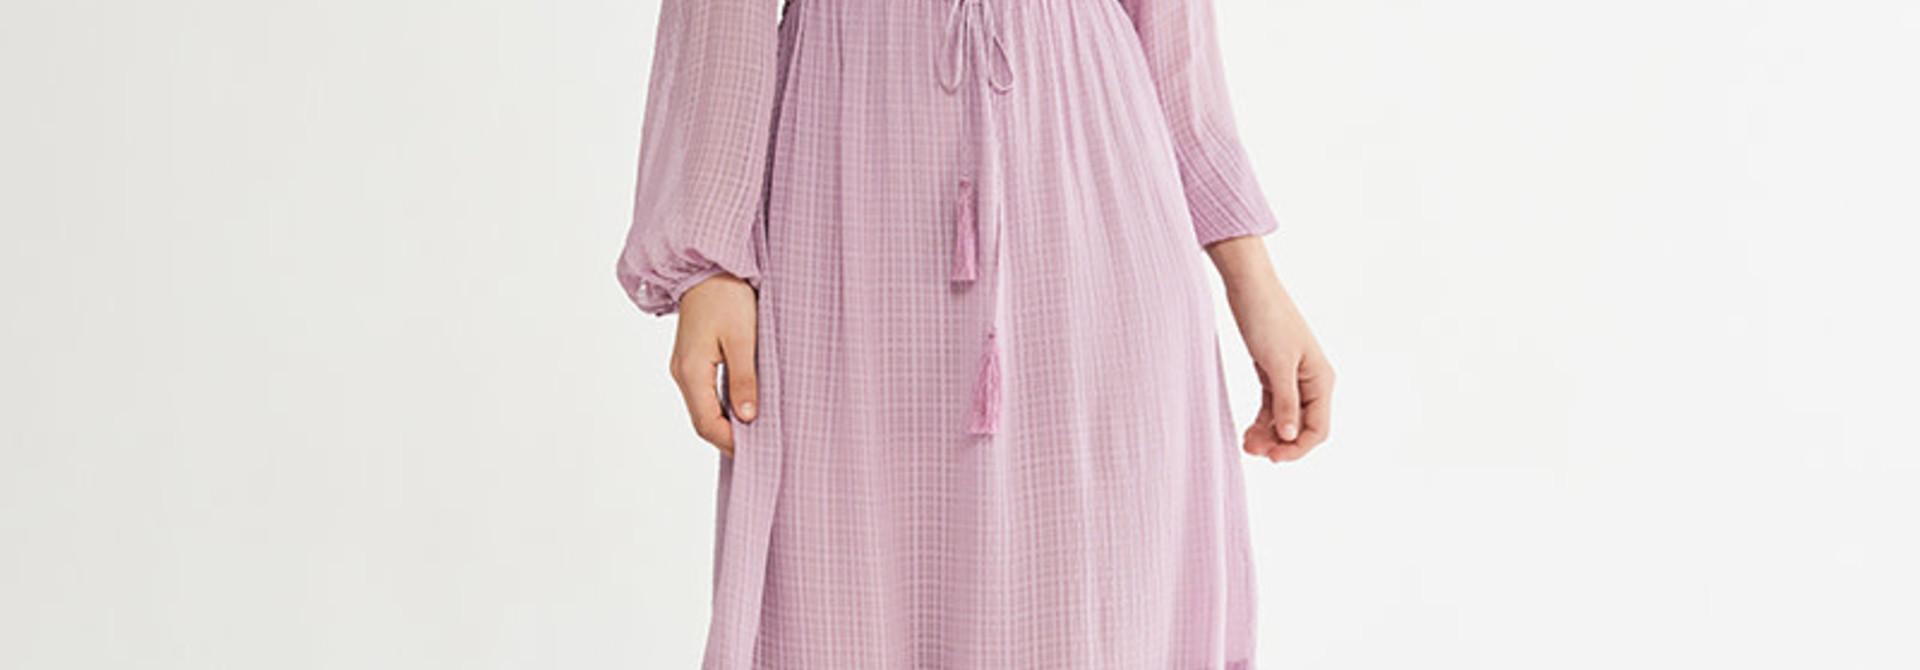 rebecca dress Vanessa Bruno